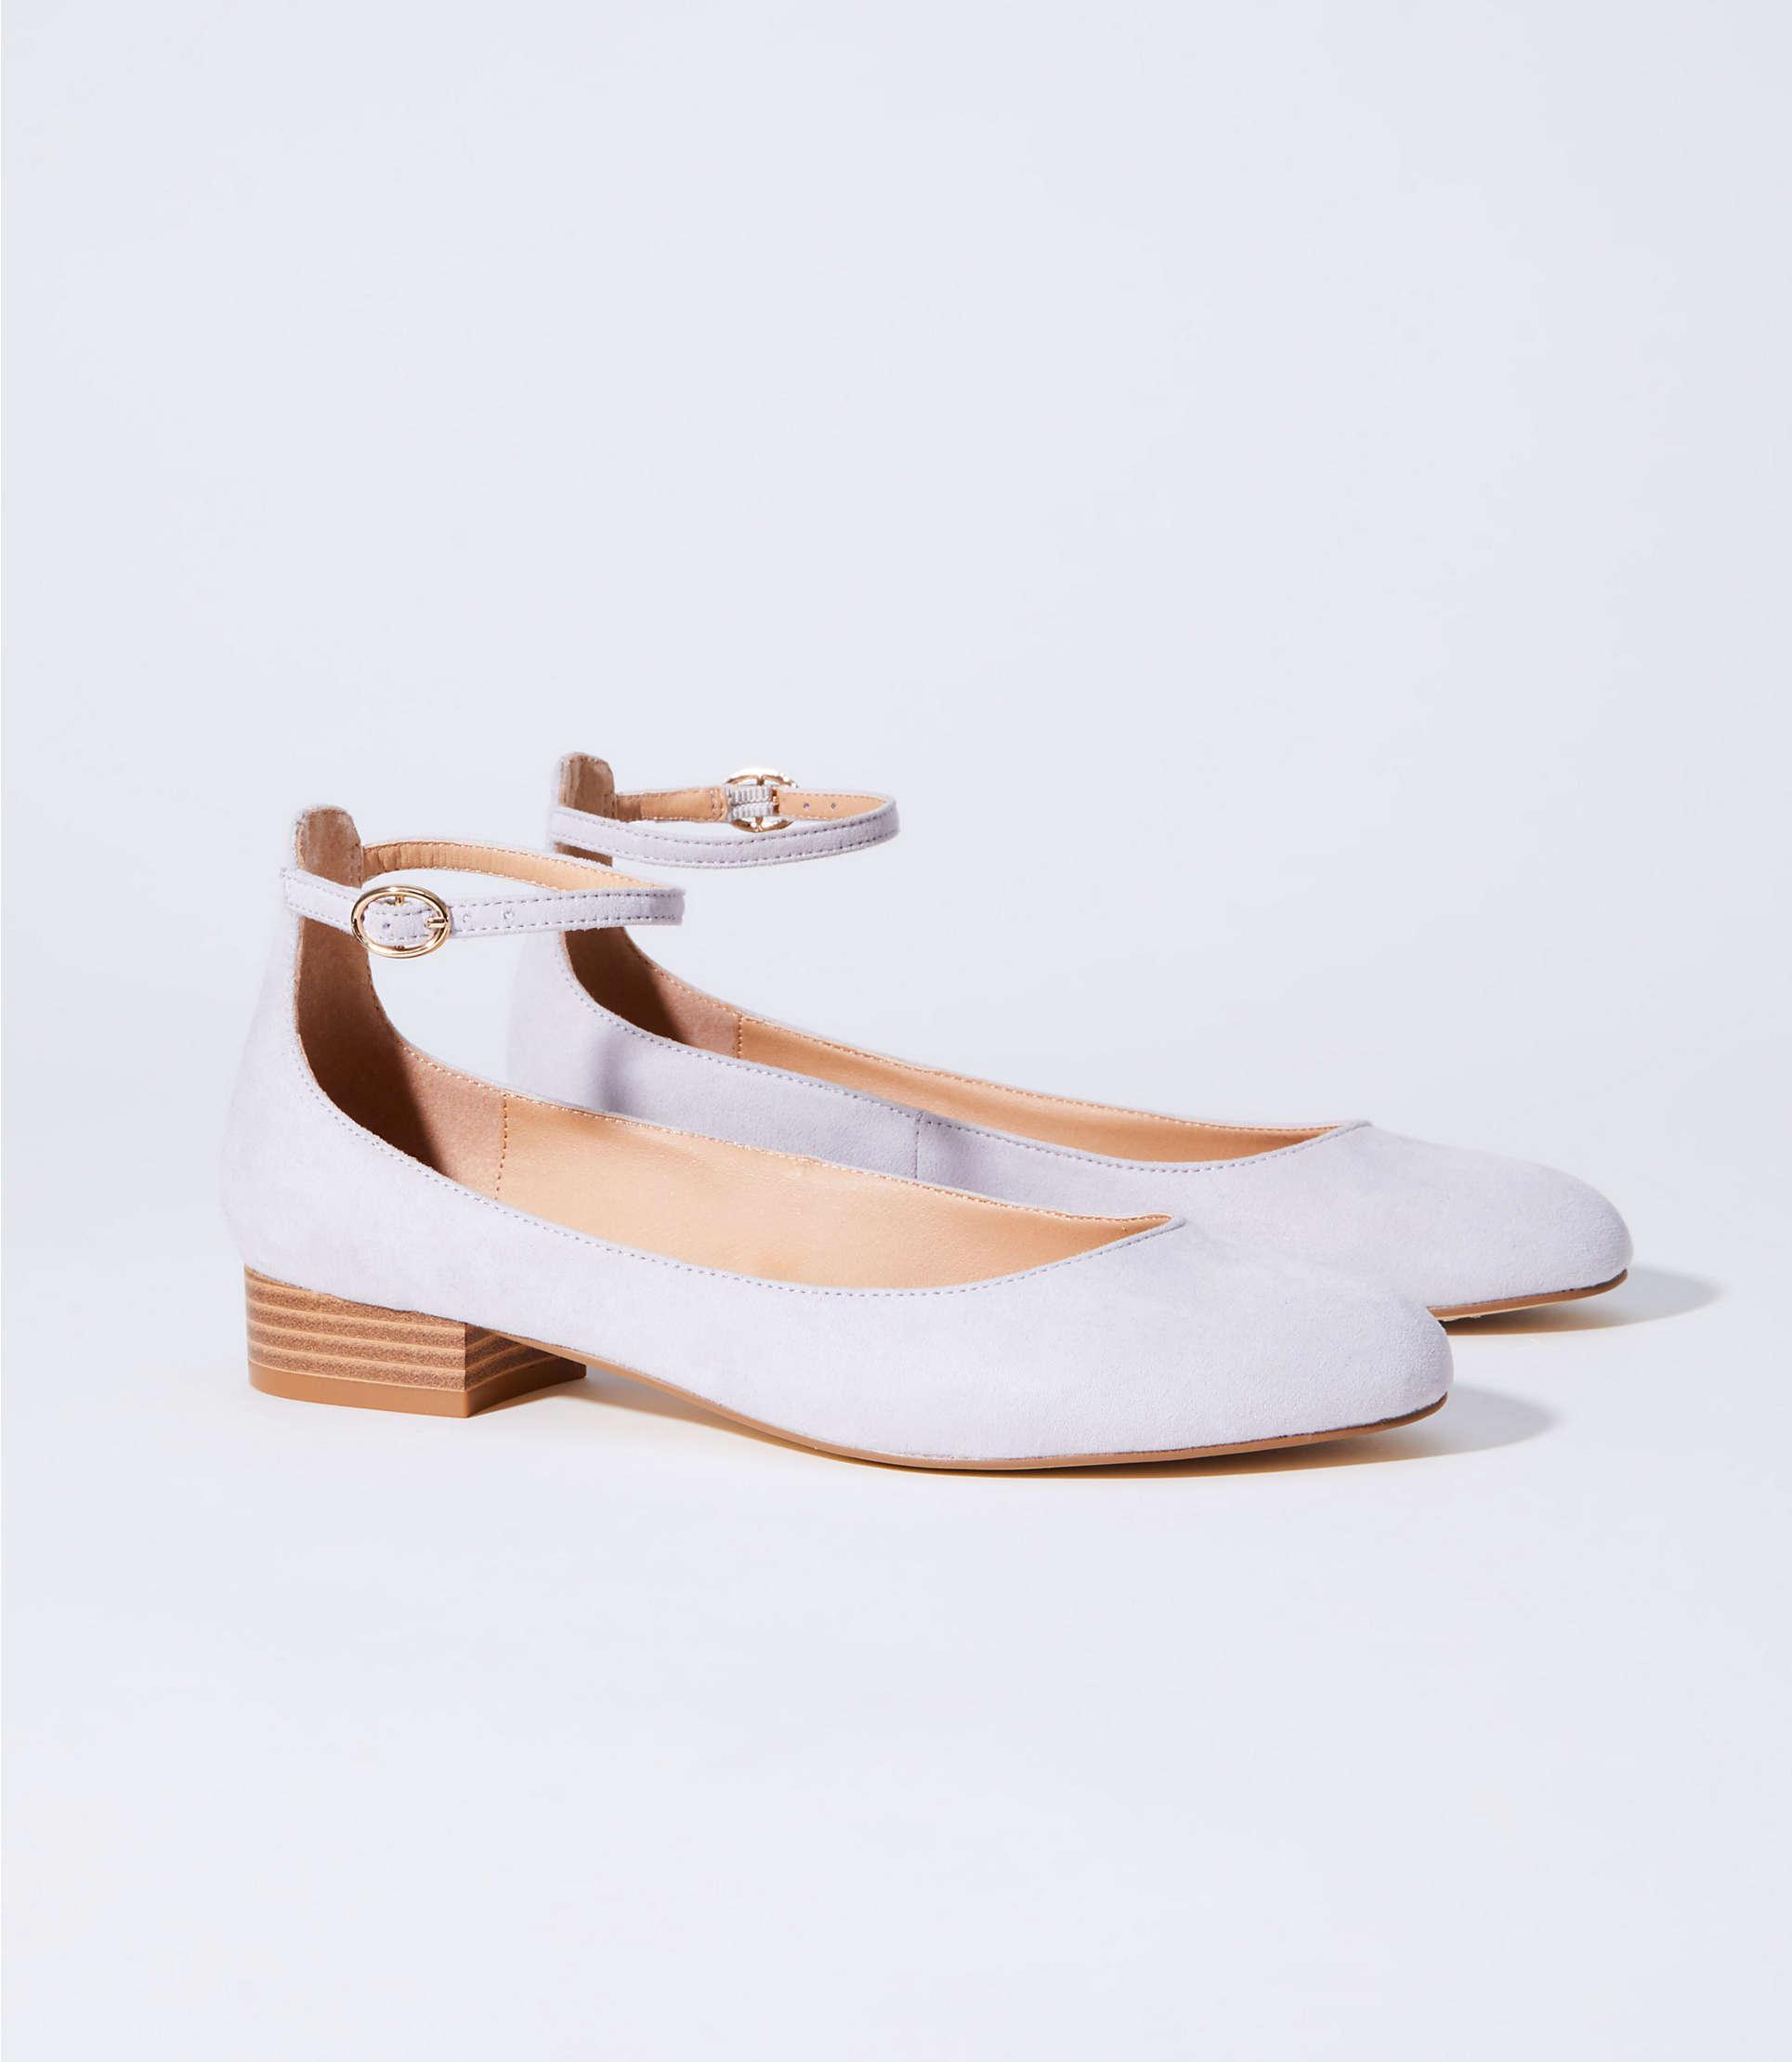 7ac82dfaf Loft Ankle Strap Block Heel Flats - Lyst